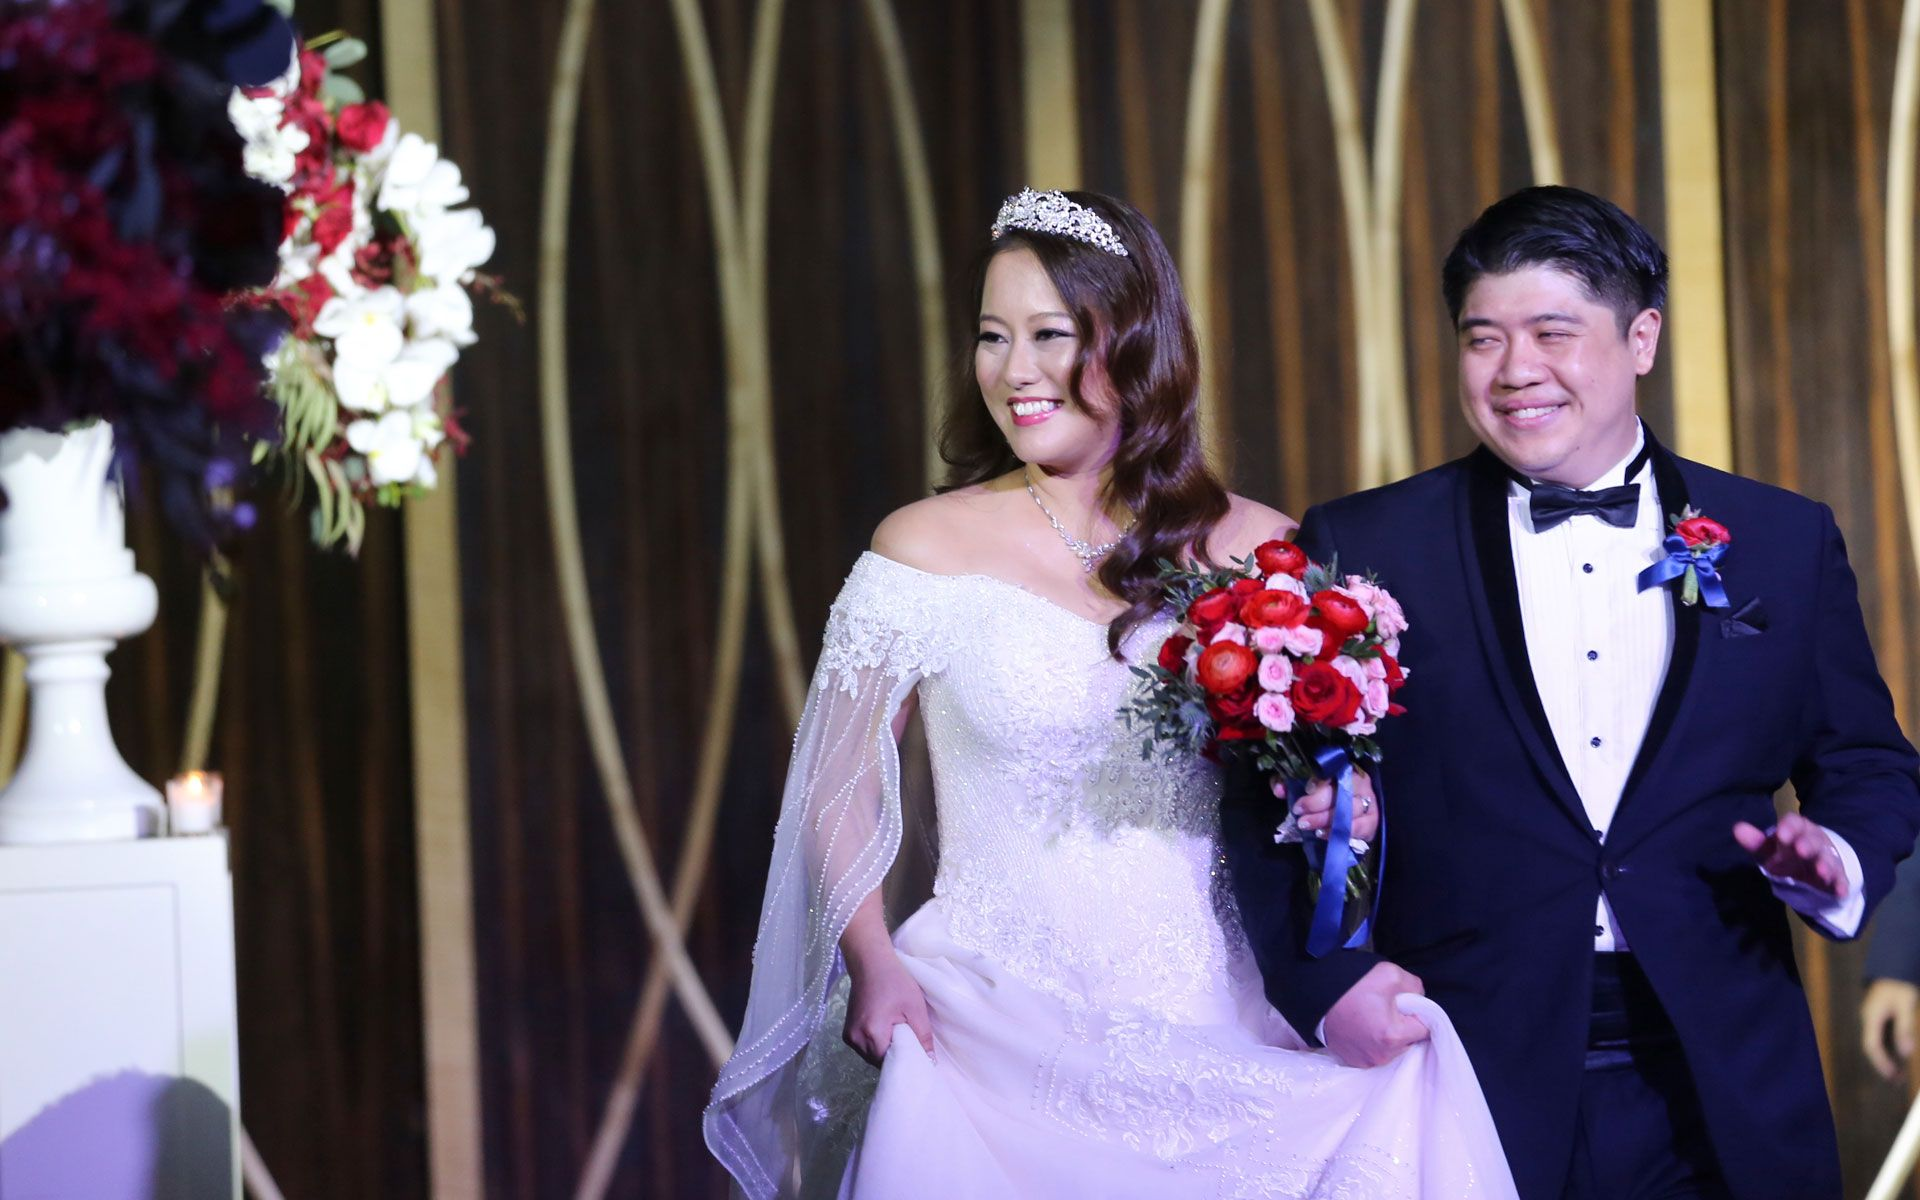 Woon Li Lian and Christopher Tock